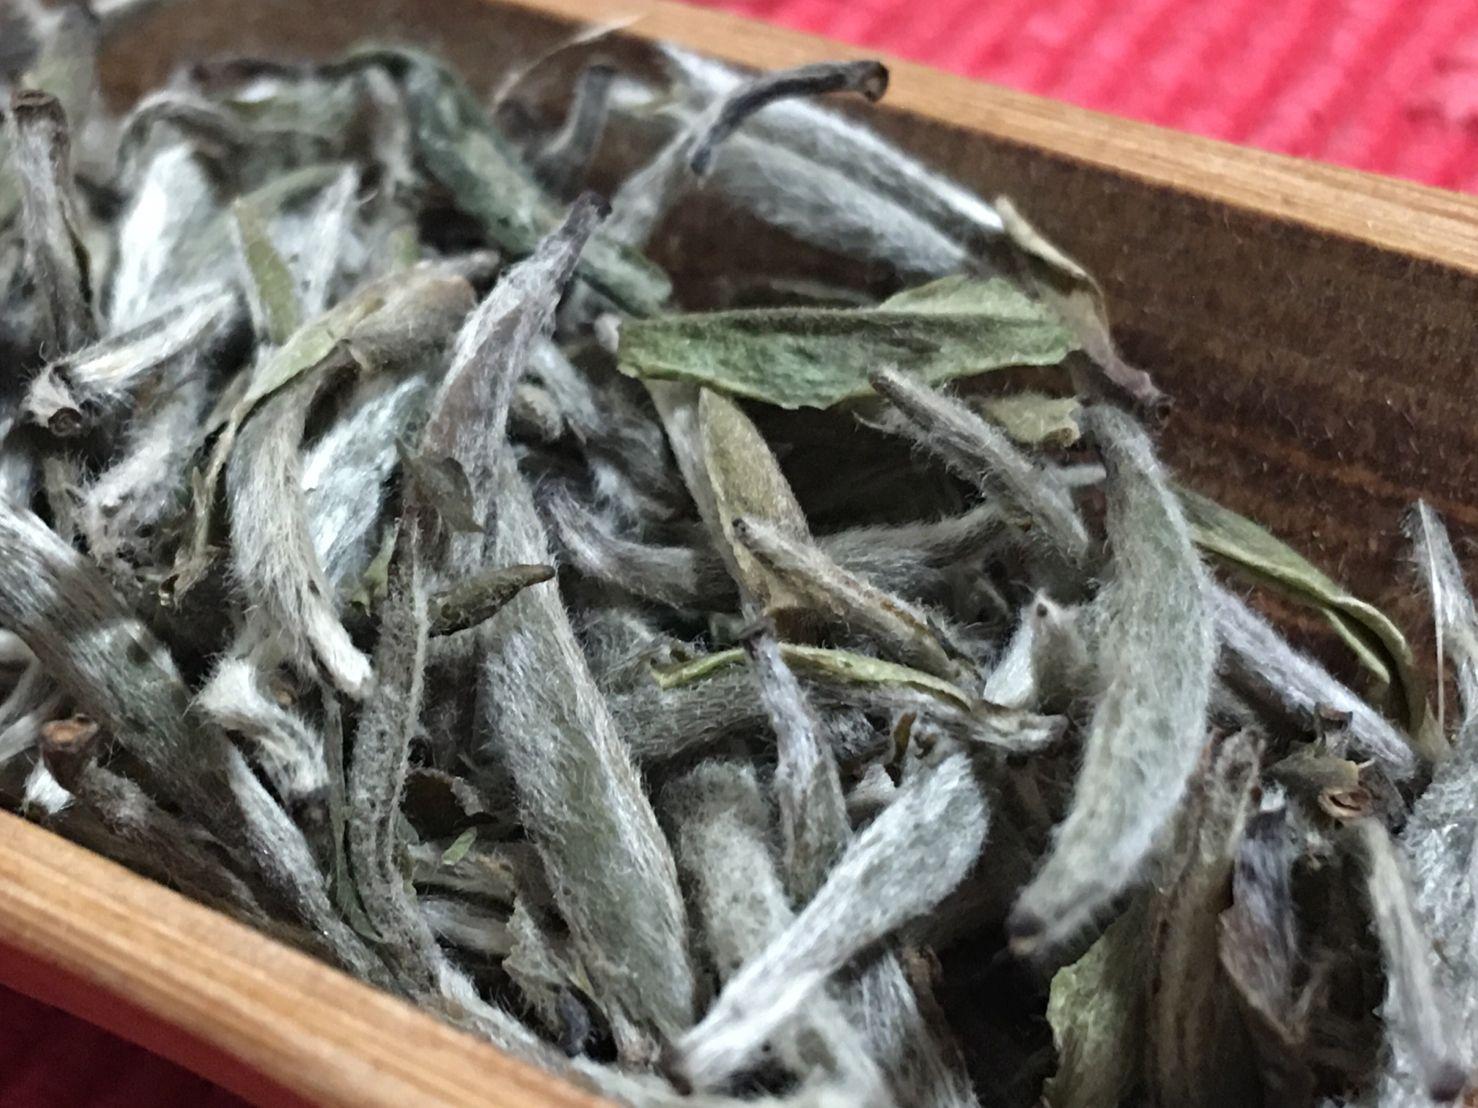 Gāoshān Báiháo Yínzhēn Chá, 高山白毫银针, High Mountain Silver Needle White Tea